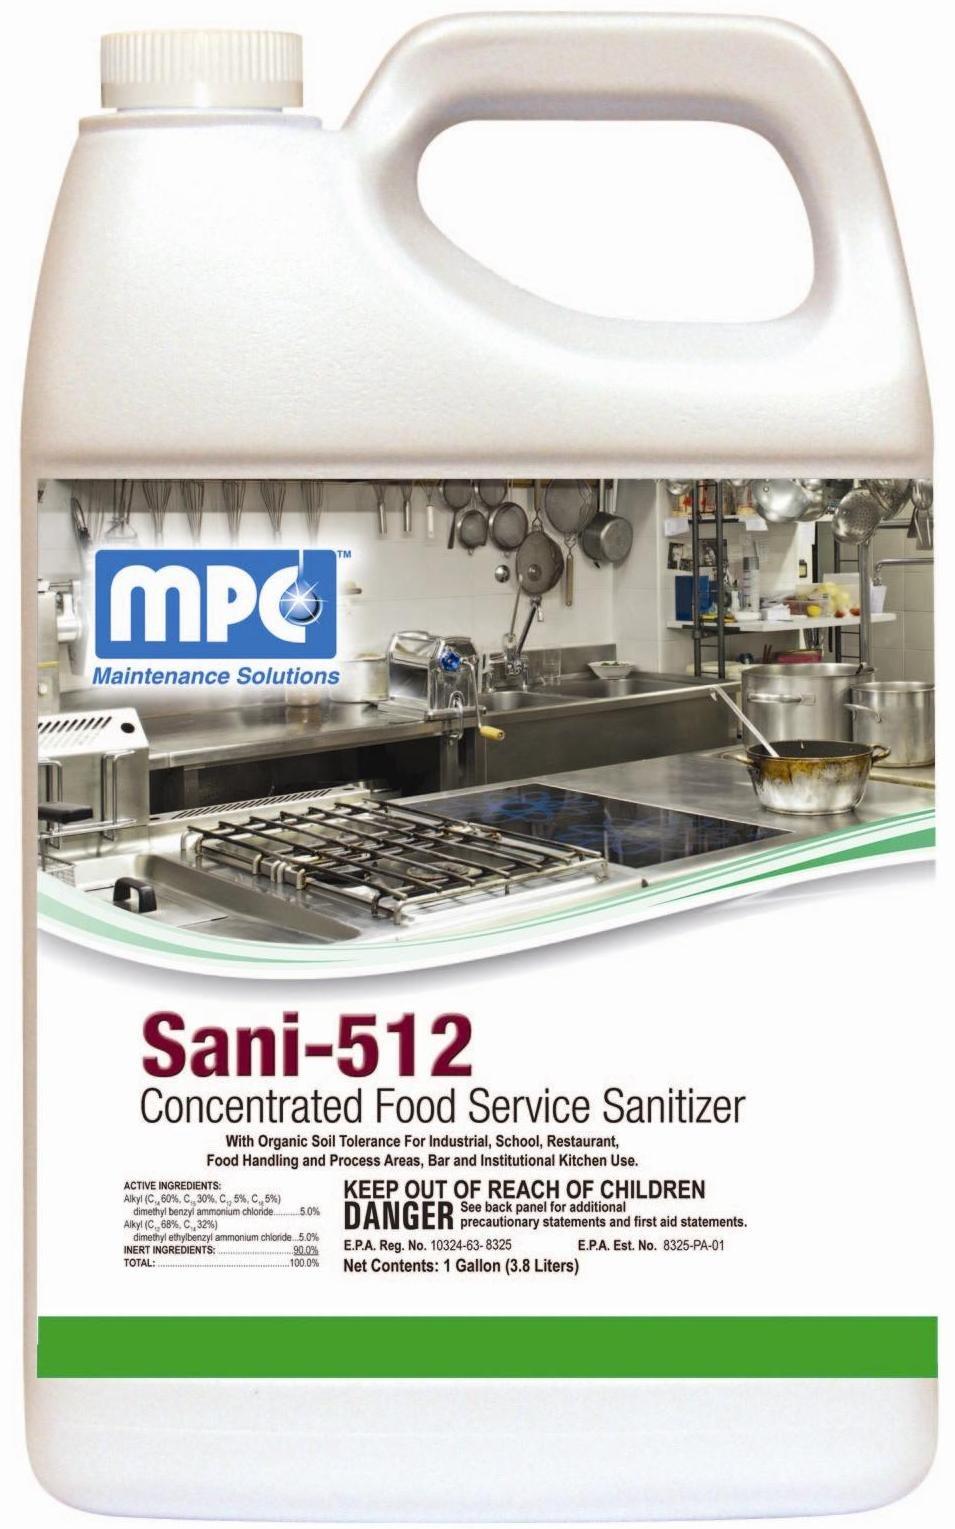 Sani 512 Sanitizer, Disinfectant & Deodorant - 4 Gallons/Case